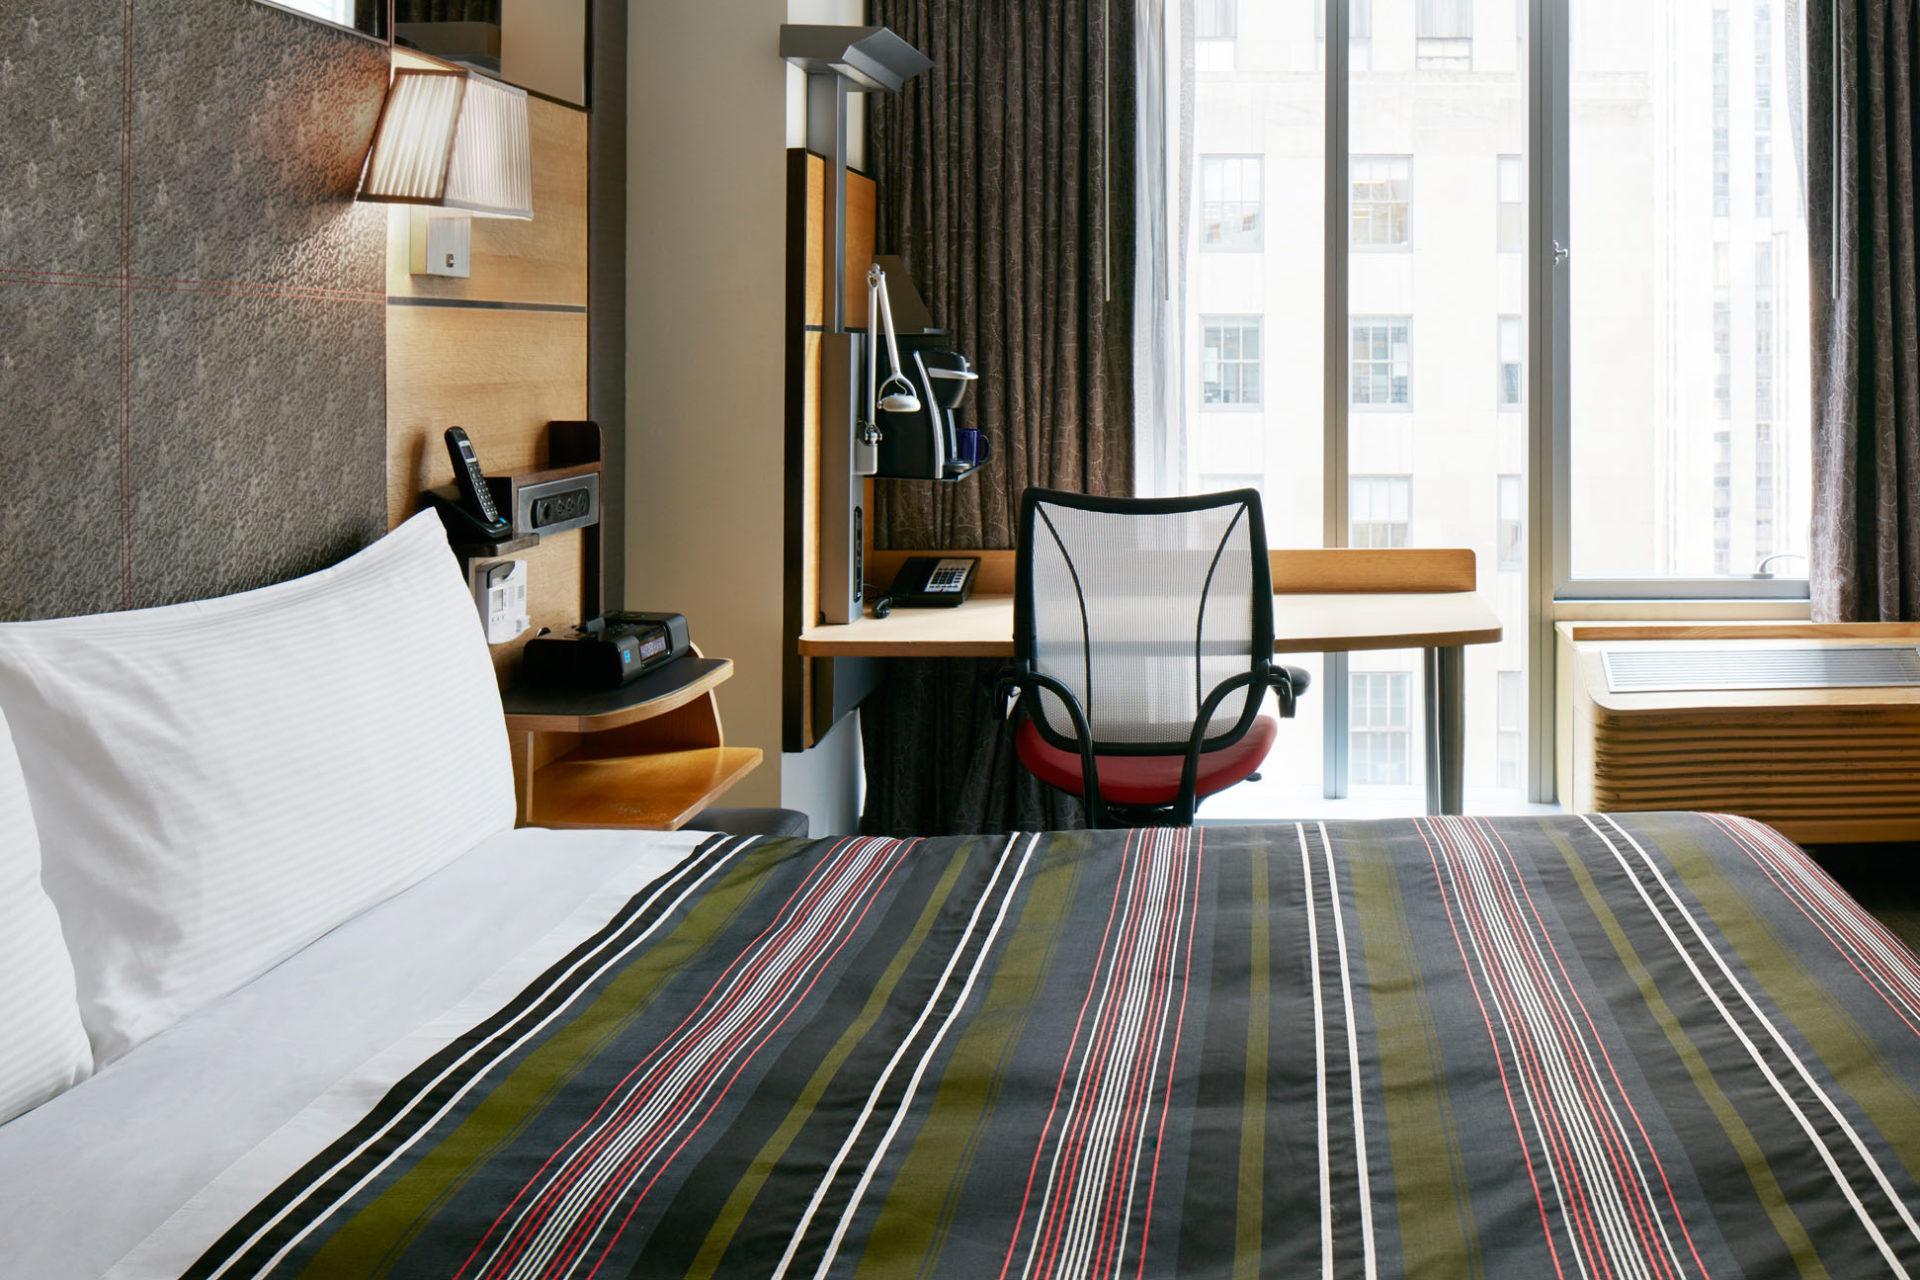 https://www.hotelsbyday.com/_data/default-hotel_image/1/7708/1401-club-room-cq-jewel-2723-2-1920x1280.jpg